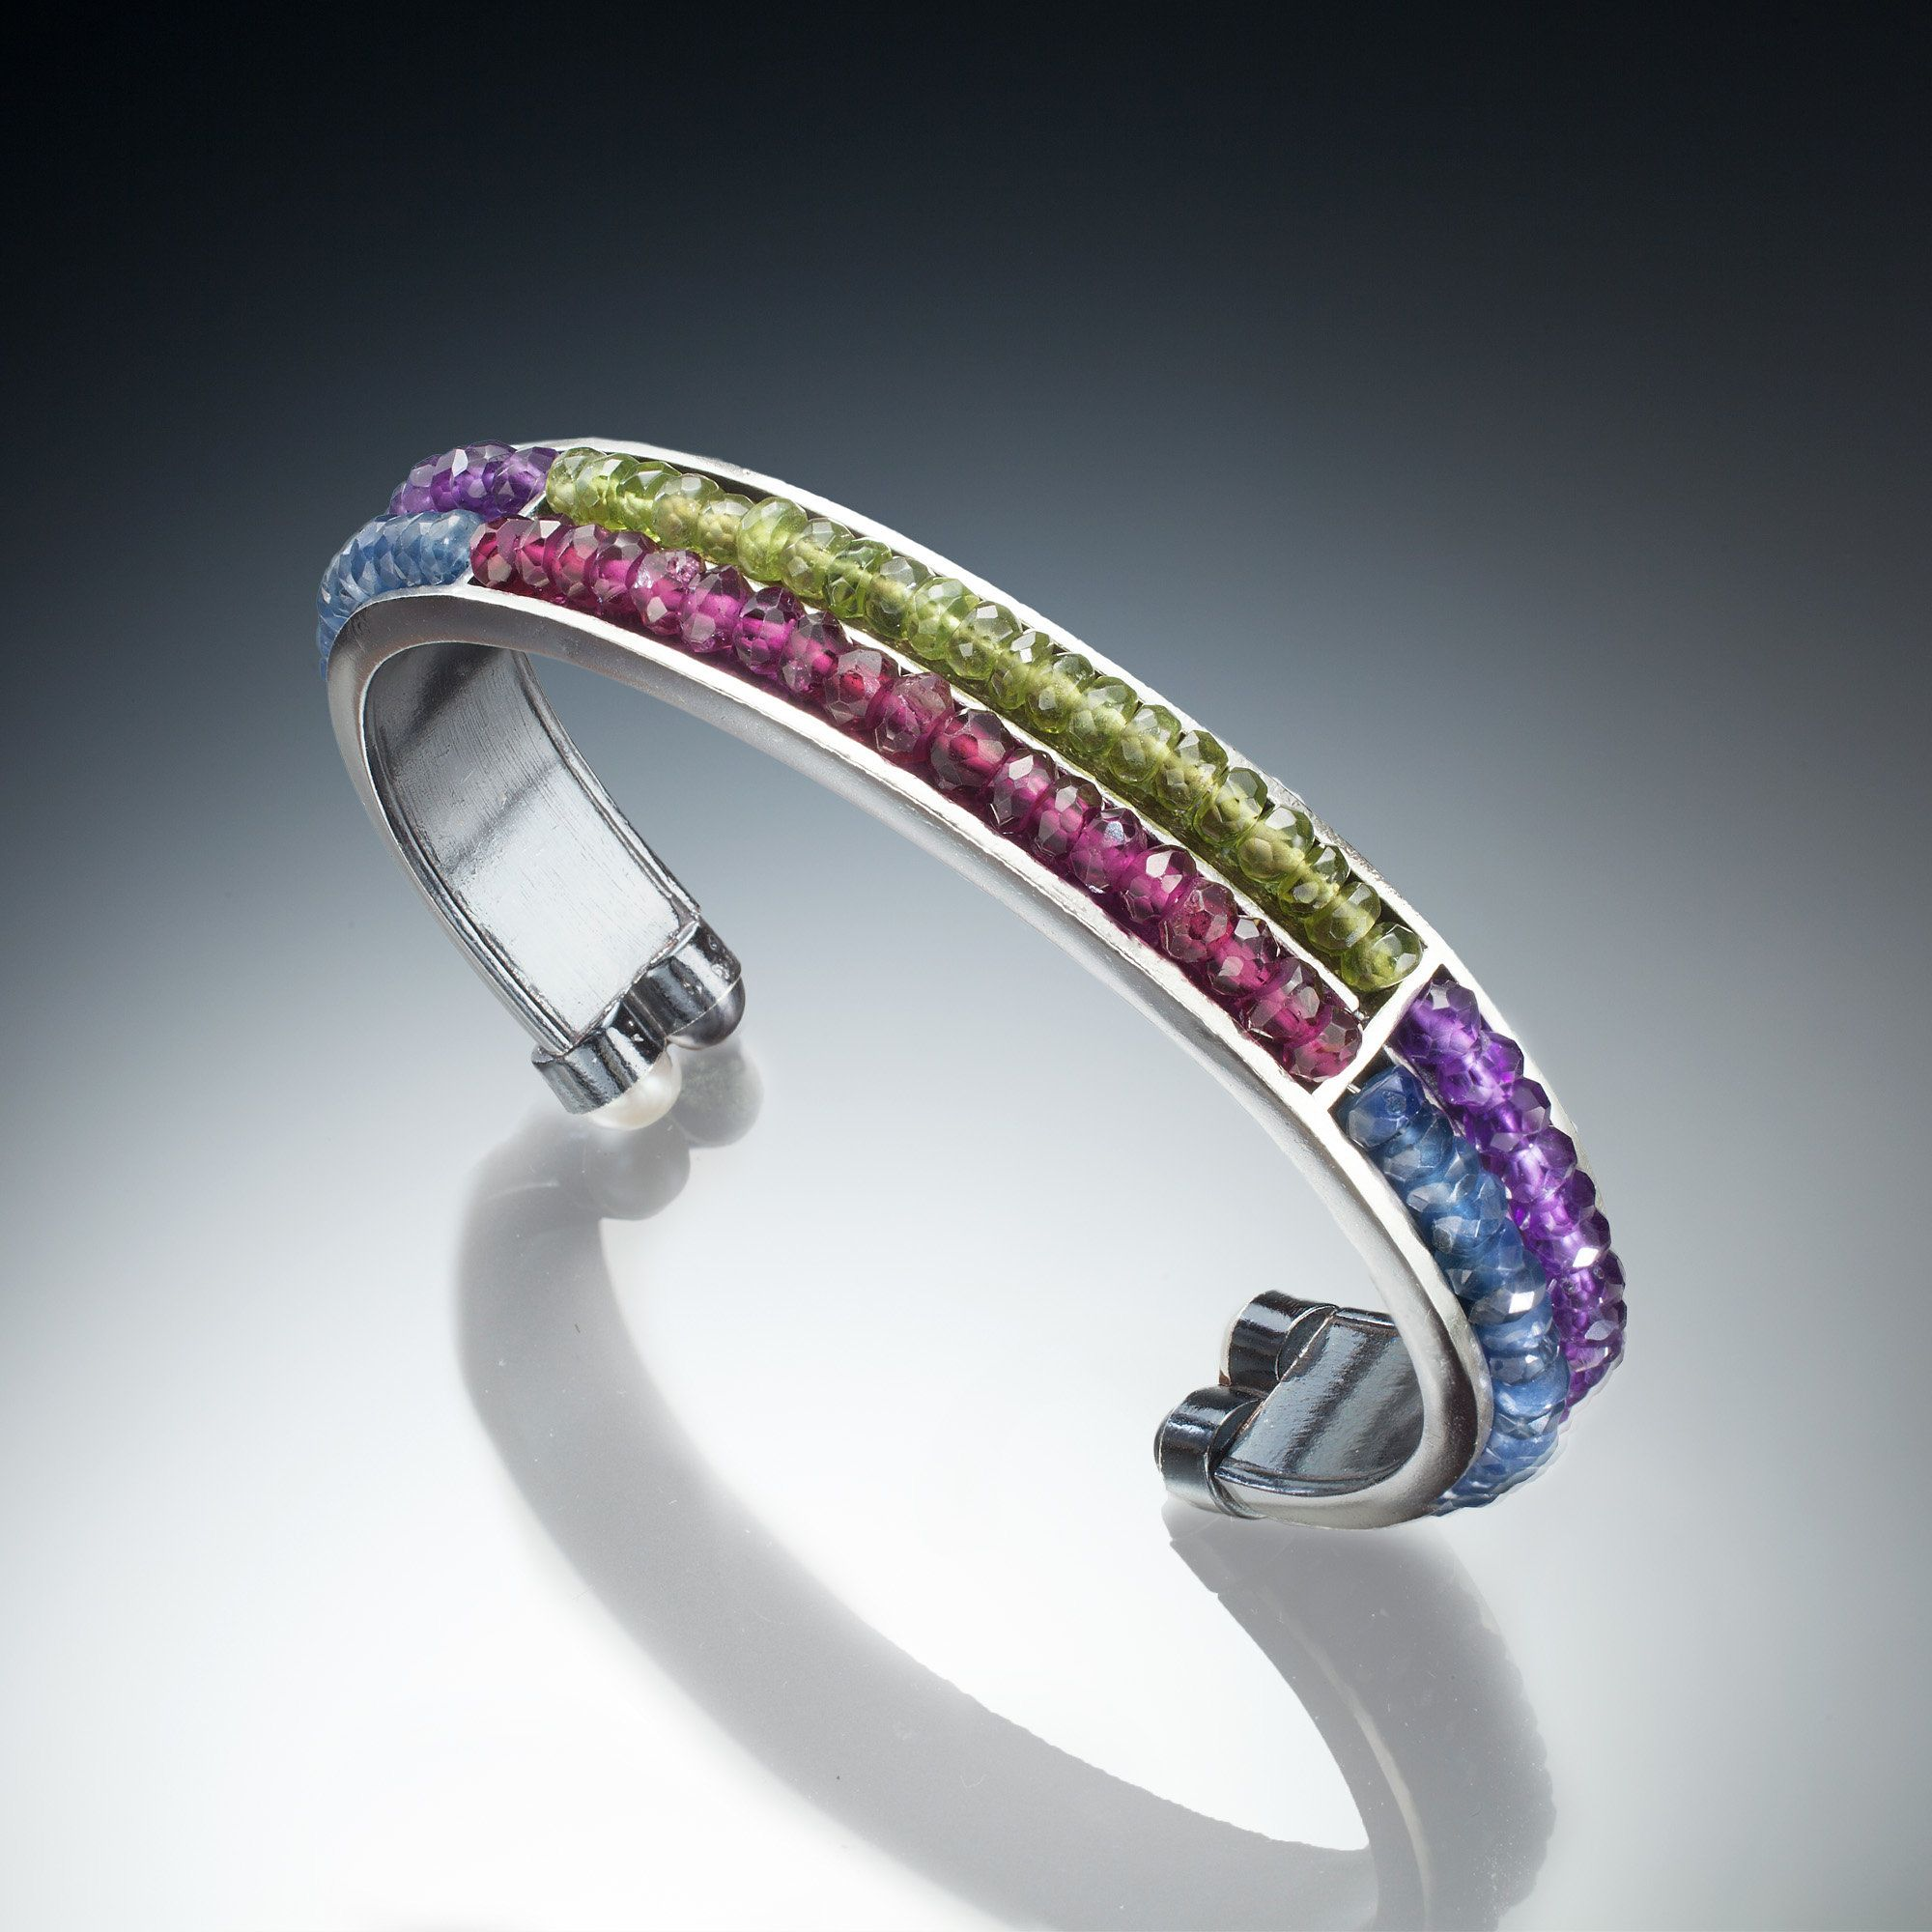 dc2620cd075 Gemstone Cuff by Susan Kinzig - Amethyst, Garnet, Iolite & Vesonite (Silver  & Stone Bracelet)